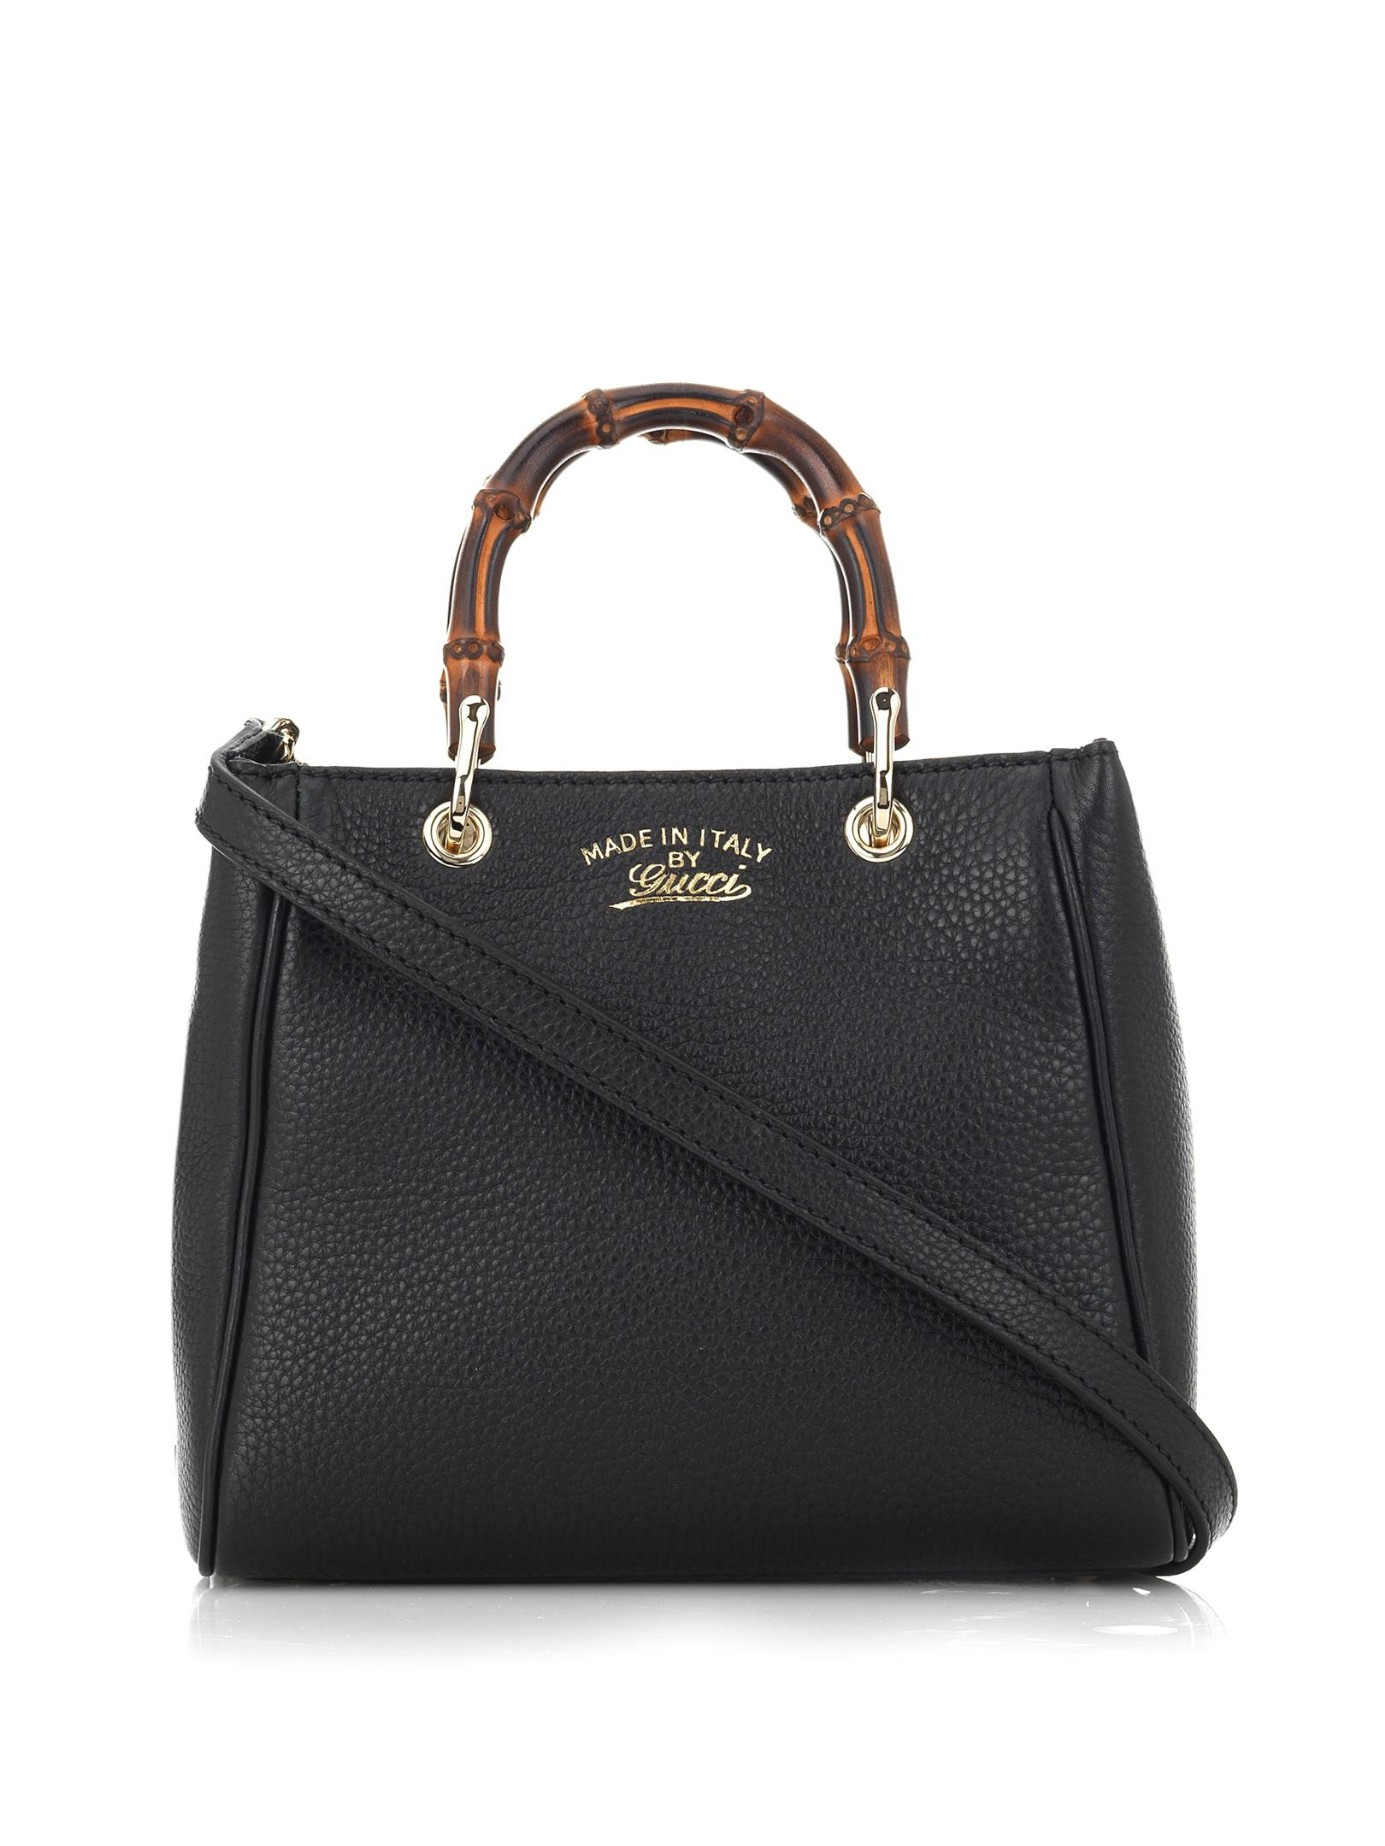 664b9a3c7b32 Lyst - Gucci Bamboo Mini Leather Cross-body Bag in Black